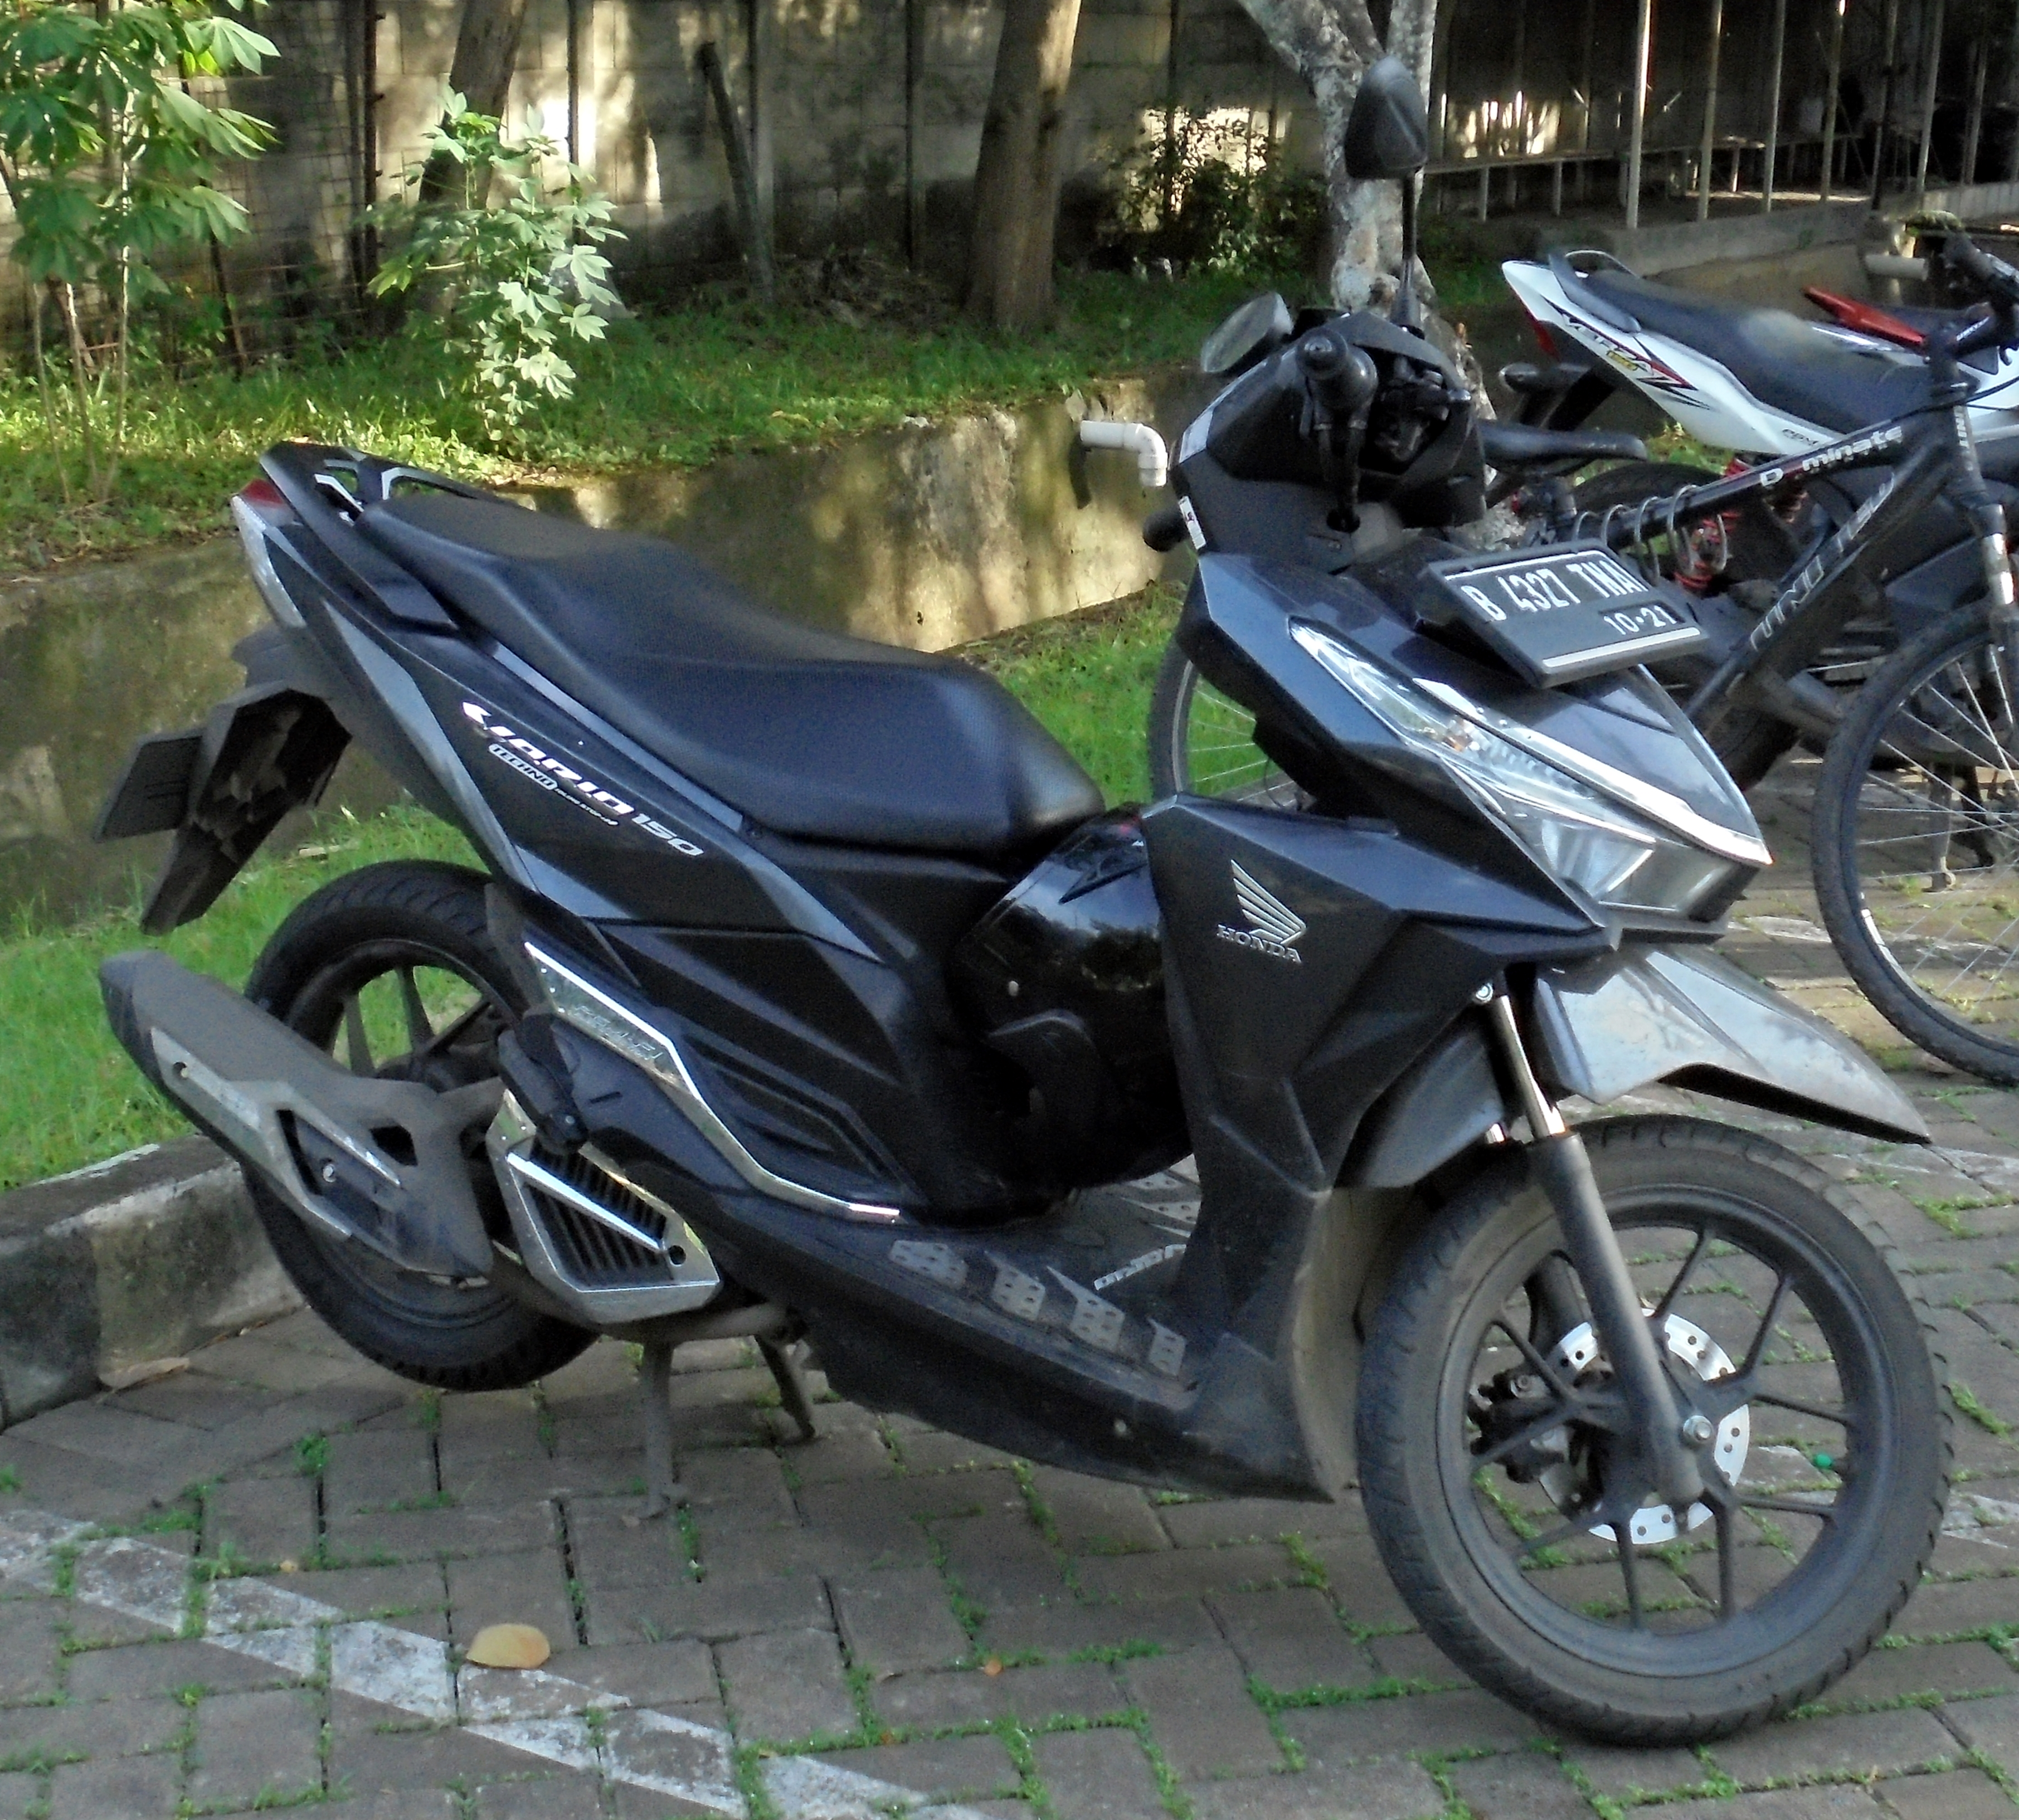 Berkas 2016 Honda Vario 150 12 20 2018 South Tangerang